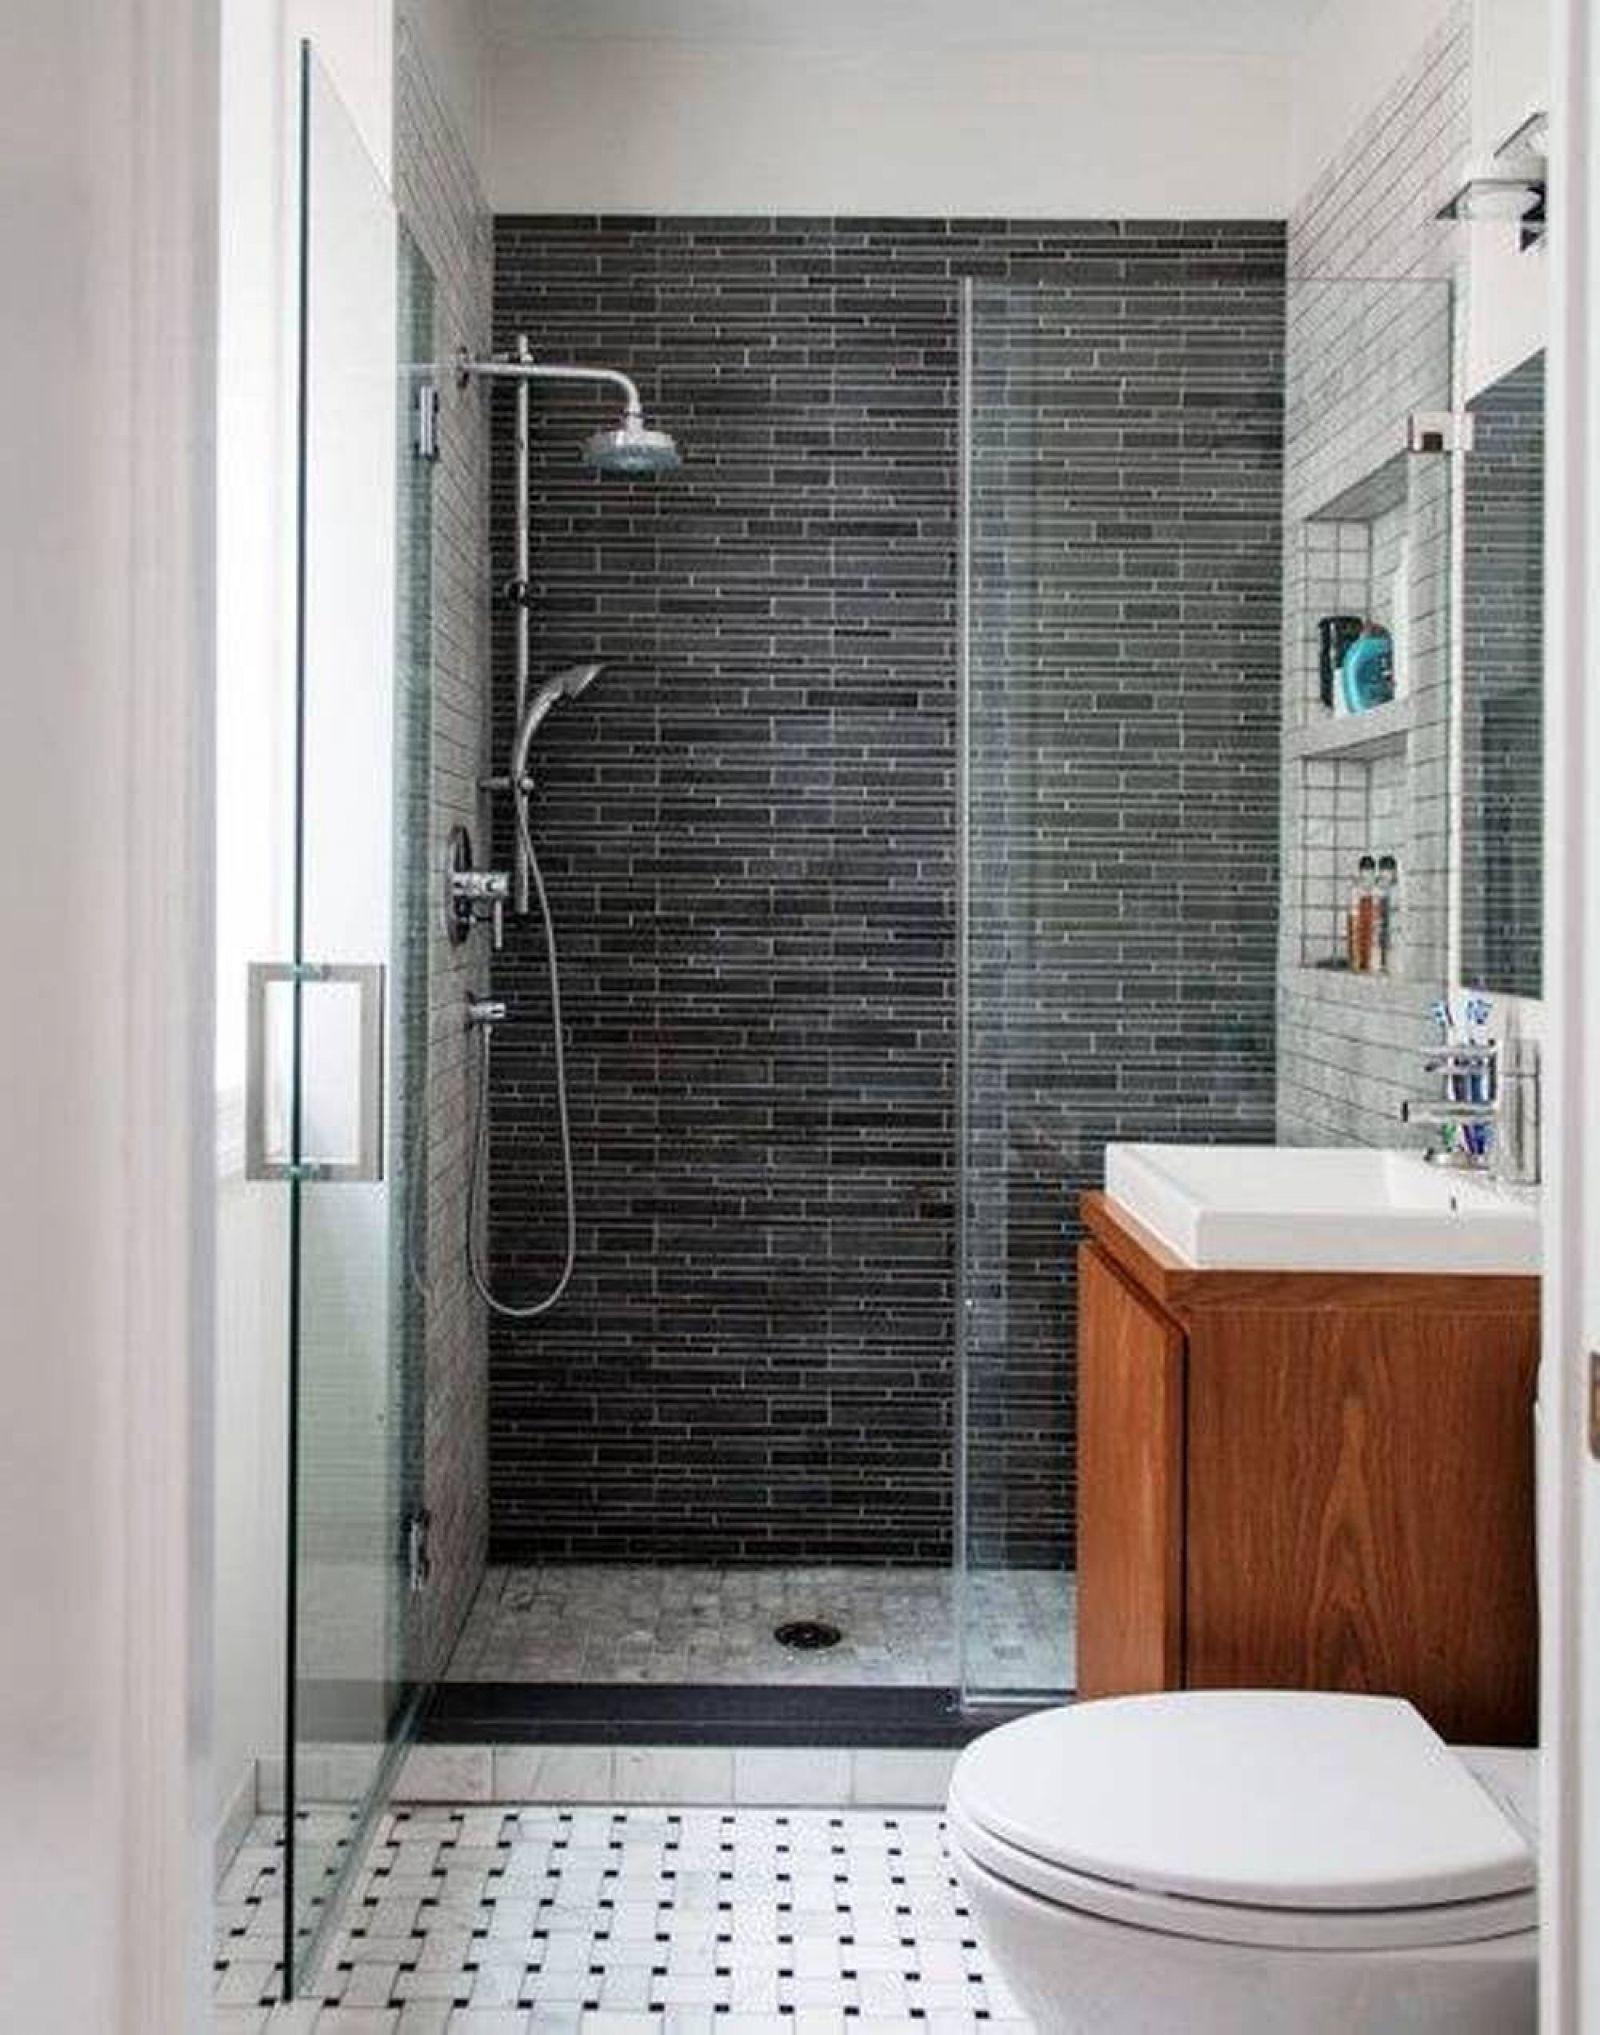 Small Bathroom Remodel Ideas On A Budget Apokatikus Cheap